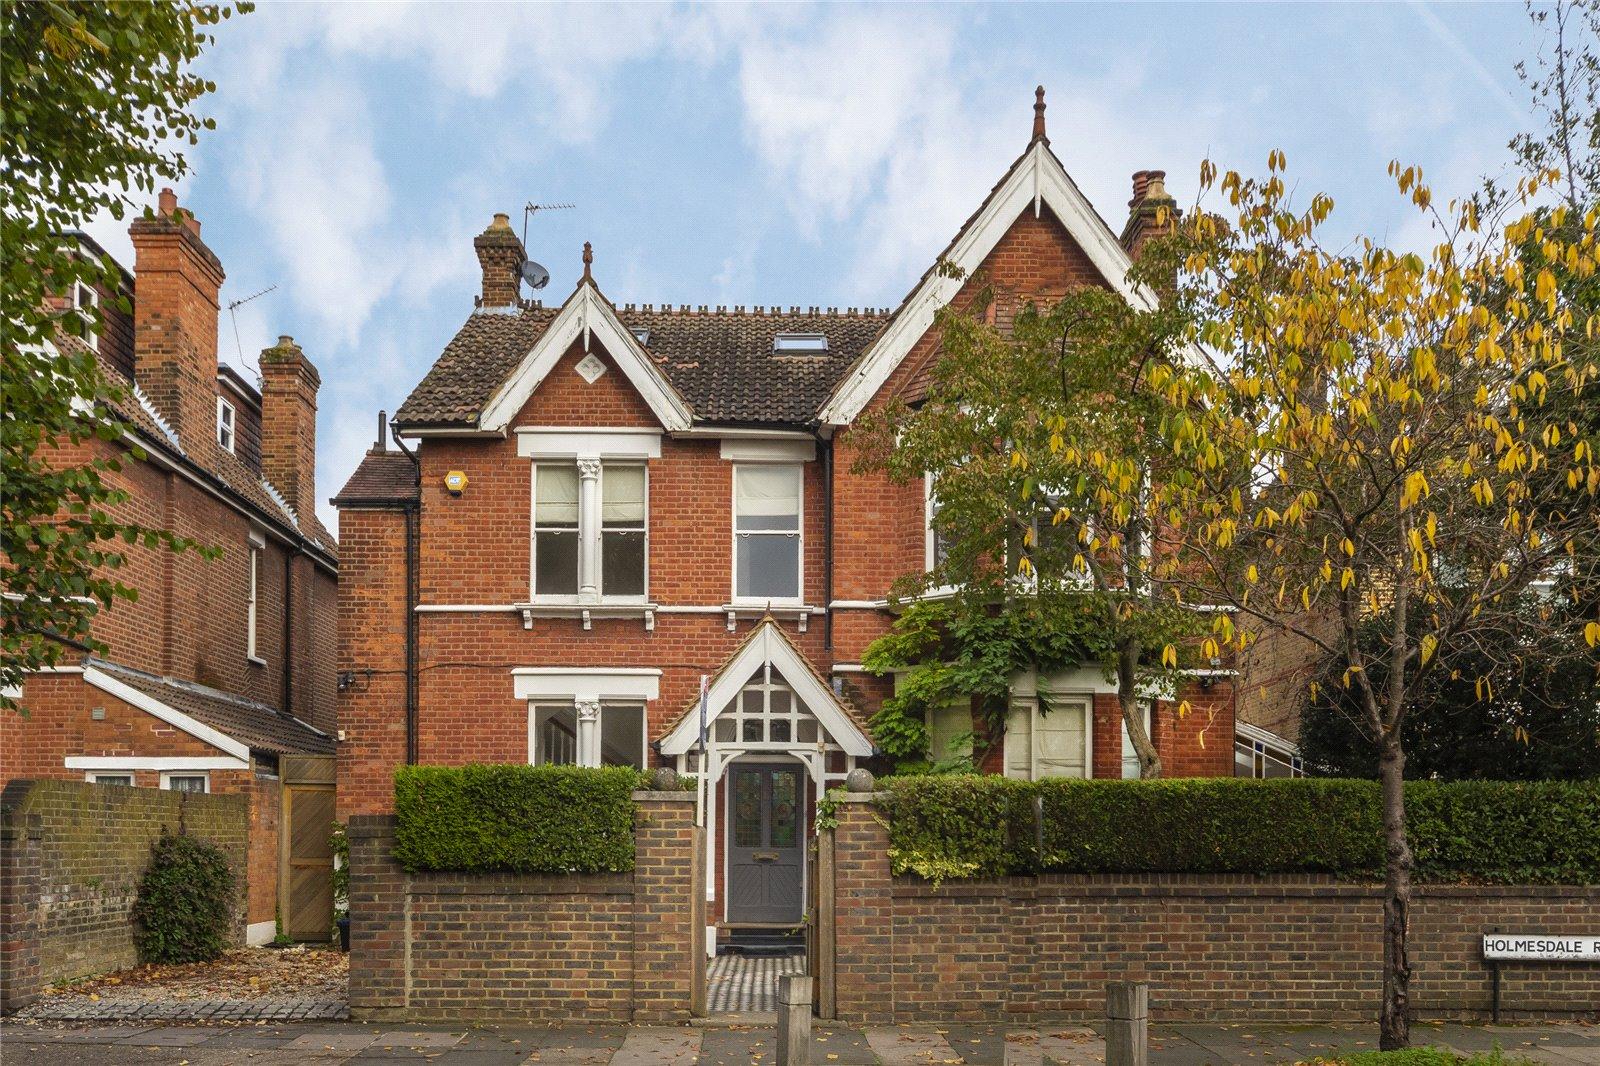 Holmesdale Road, Kew, TW9 3JZ - Antony Roberts